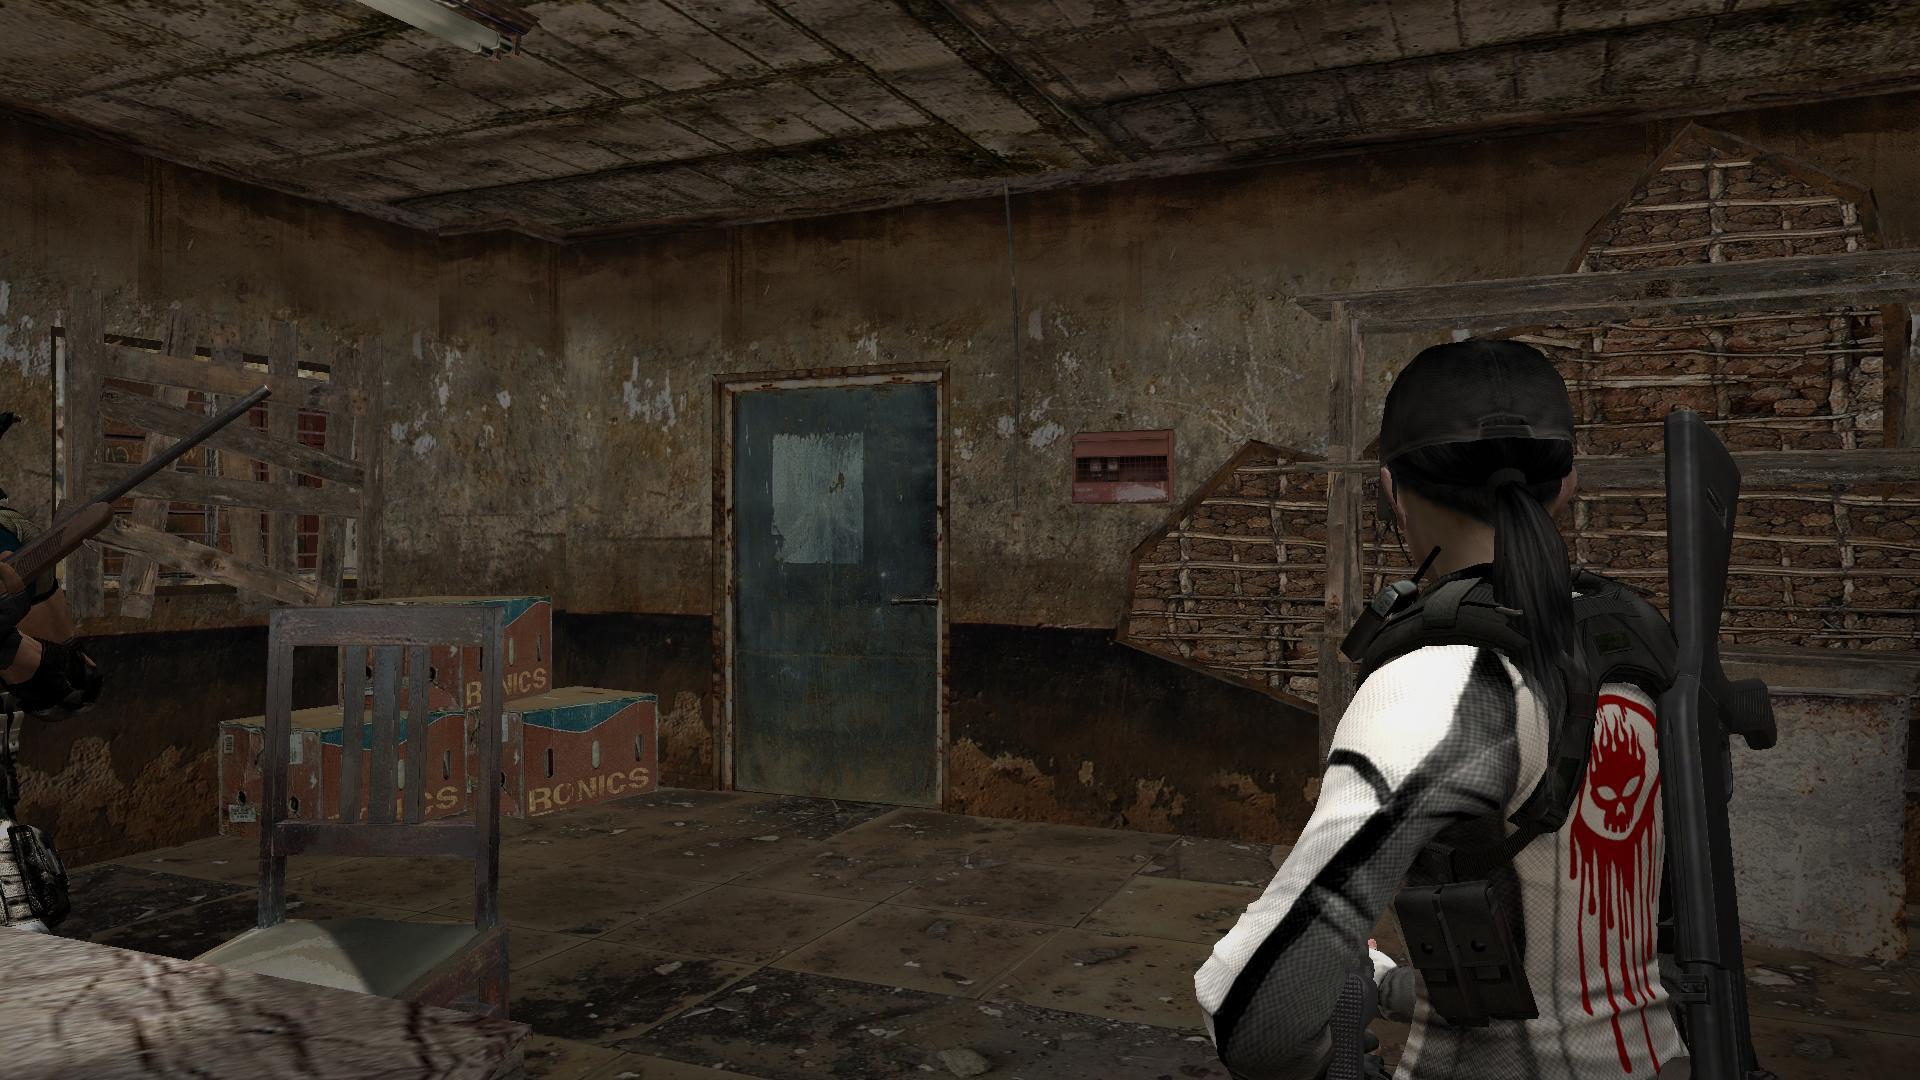 Resident evil 5 sheva cloning mods pron images